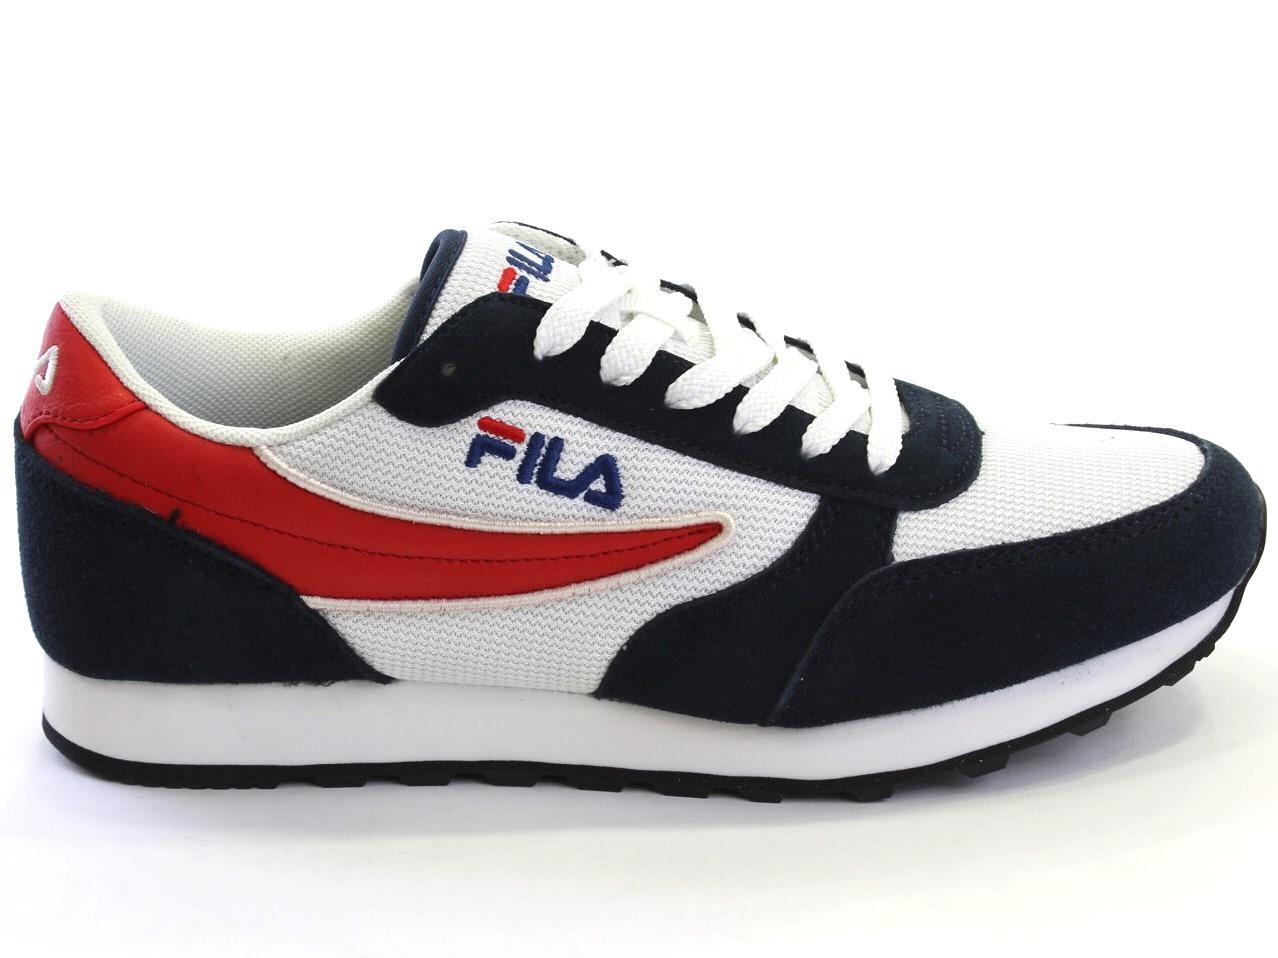 Sneakers and Espadrilles Fila 478 1010589 Glispe Store